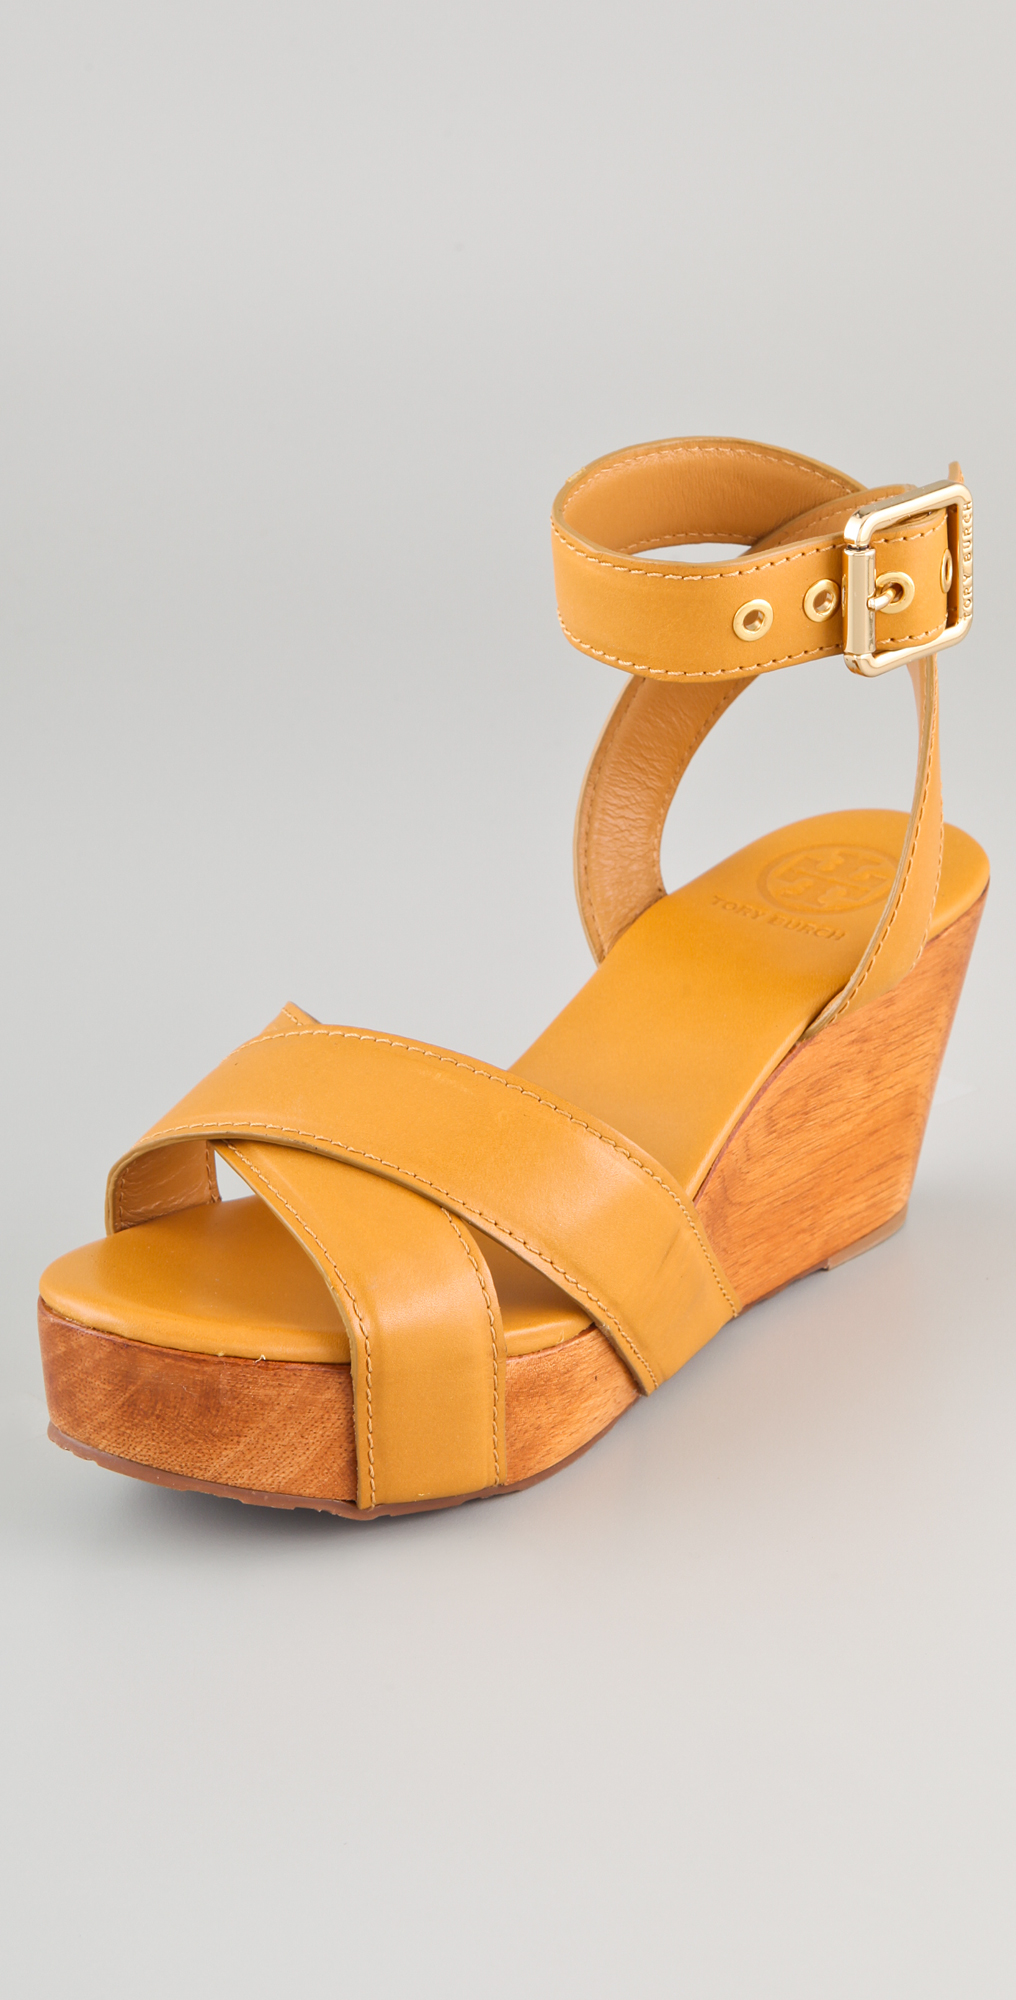 63b116a5f9d Tory Burch Almita Wedge Sandals